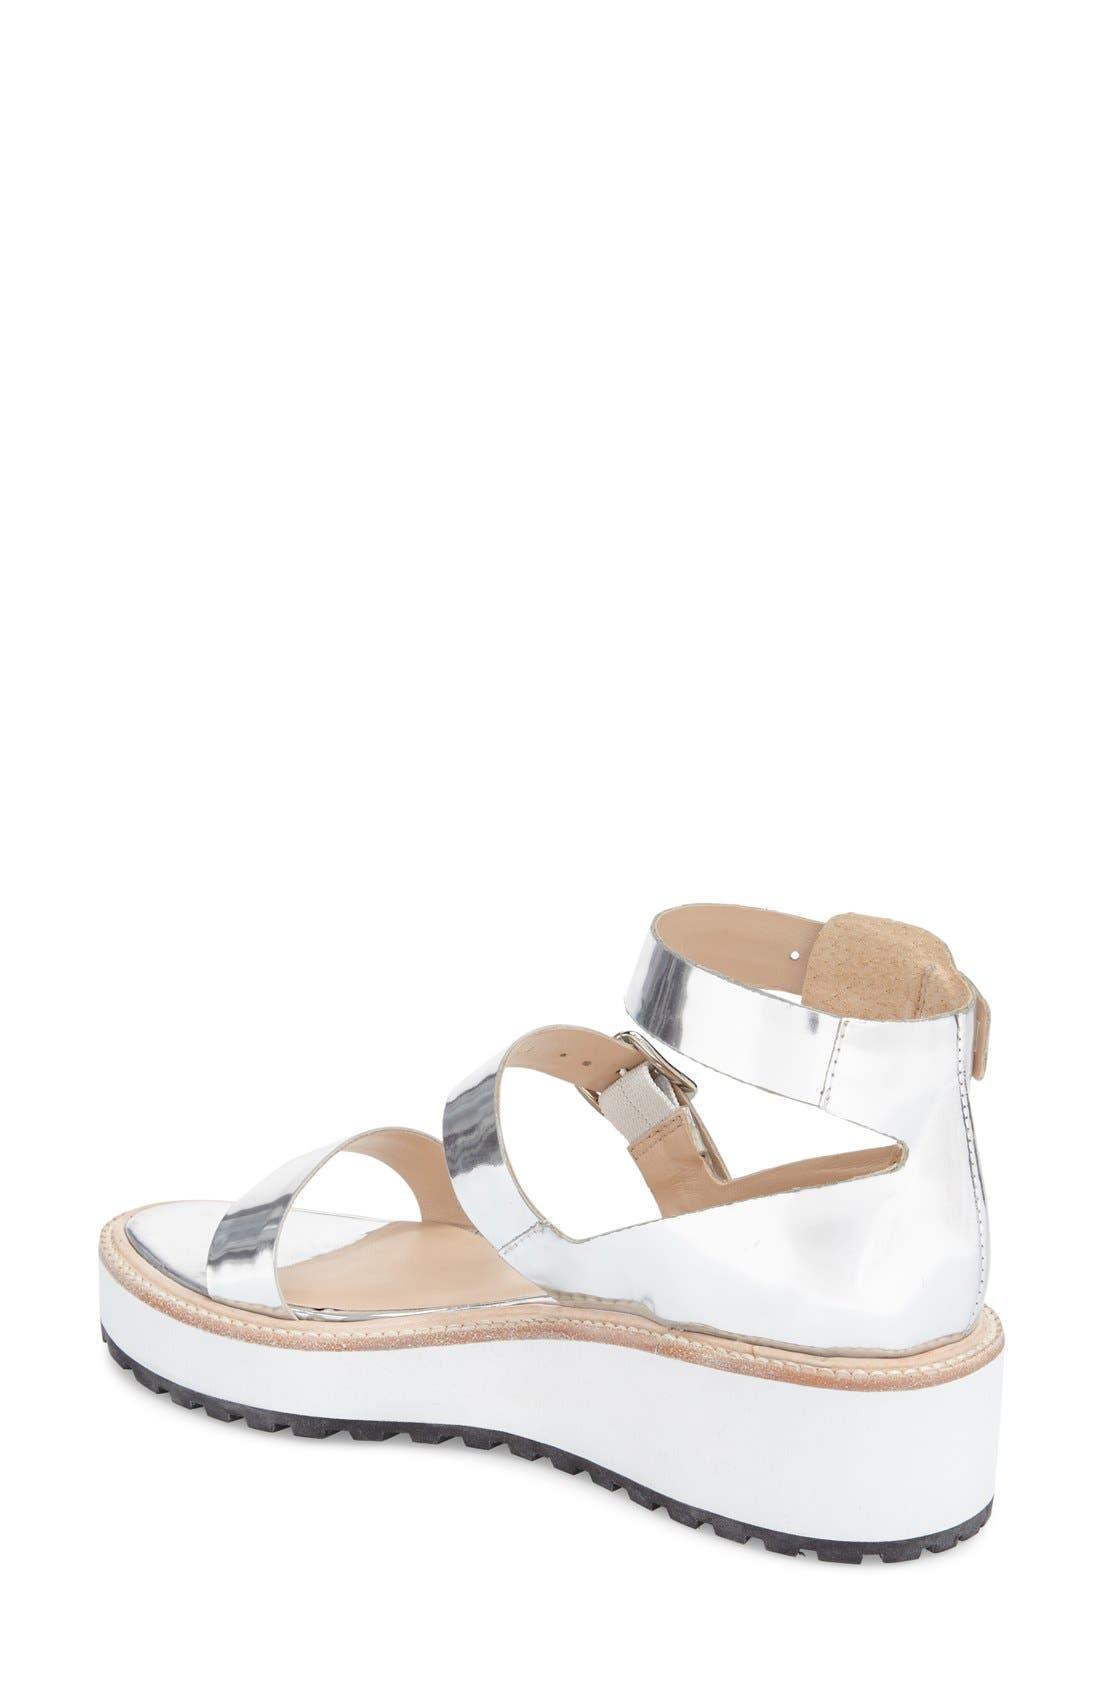 Alternate Image 2  - Loeffler Randall 'Pia' Platform Wedge Sandal (Women)